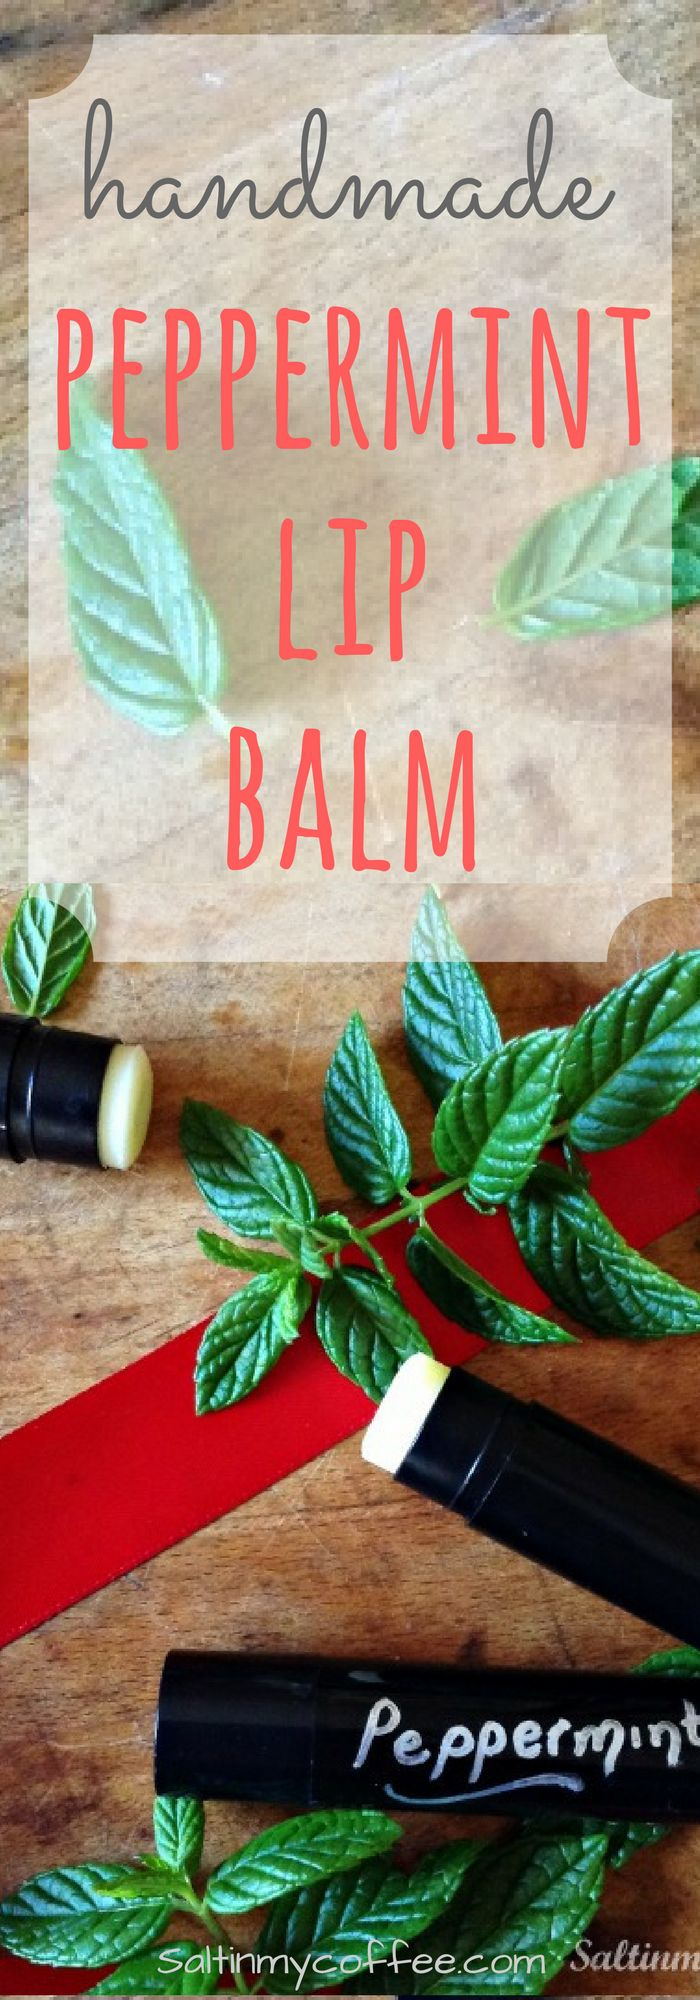 BEST recipe for handmade peppermint lip balm!